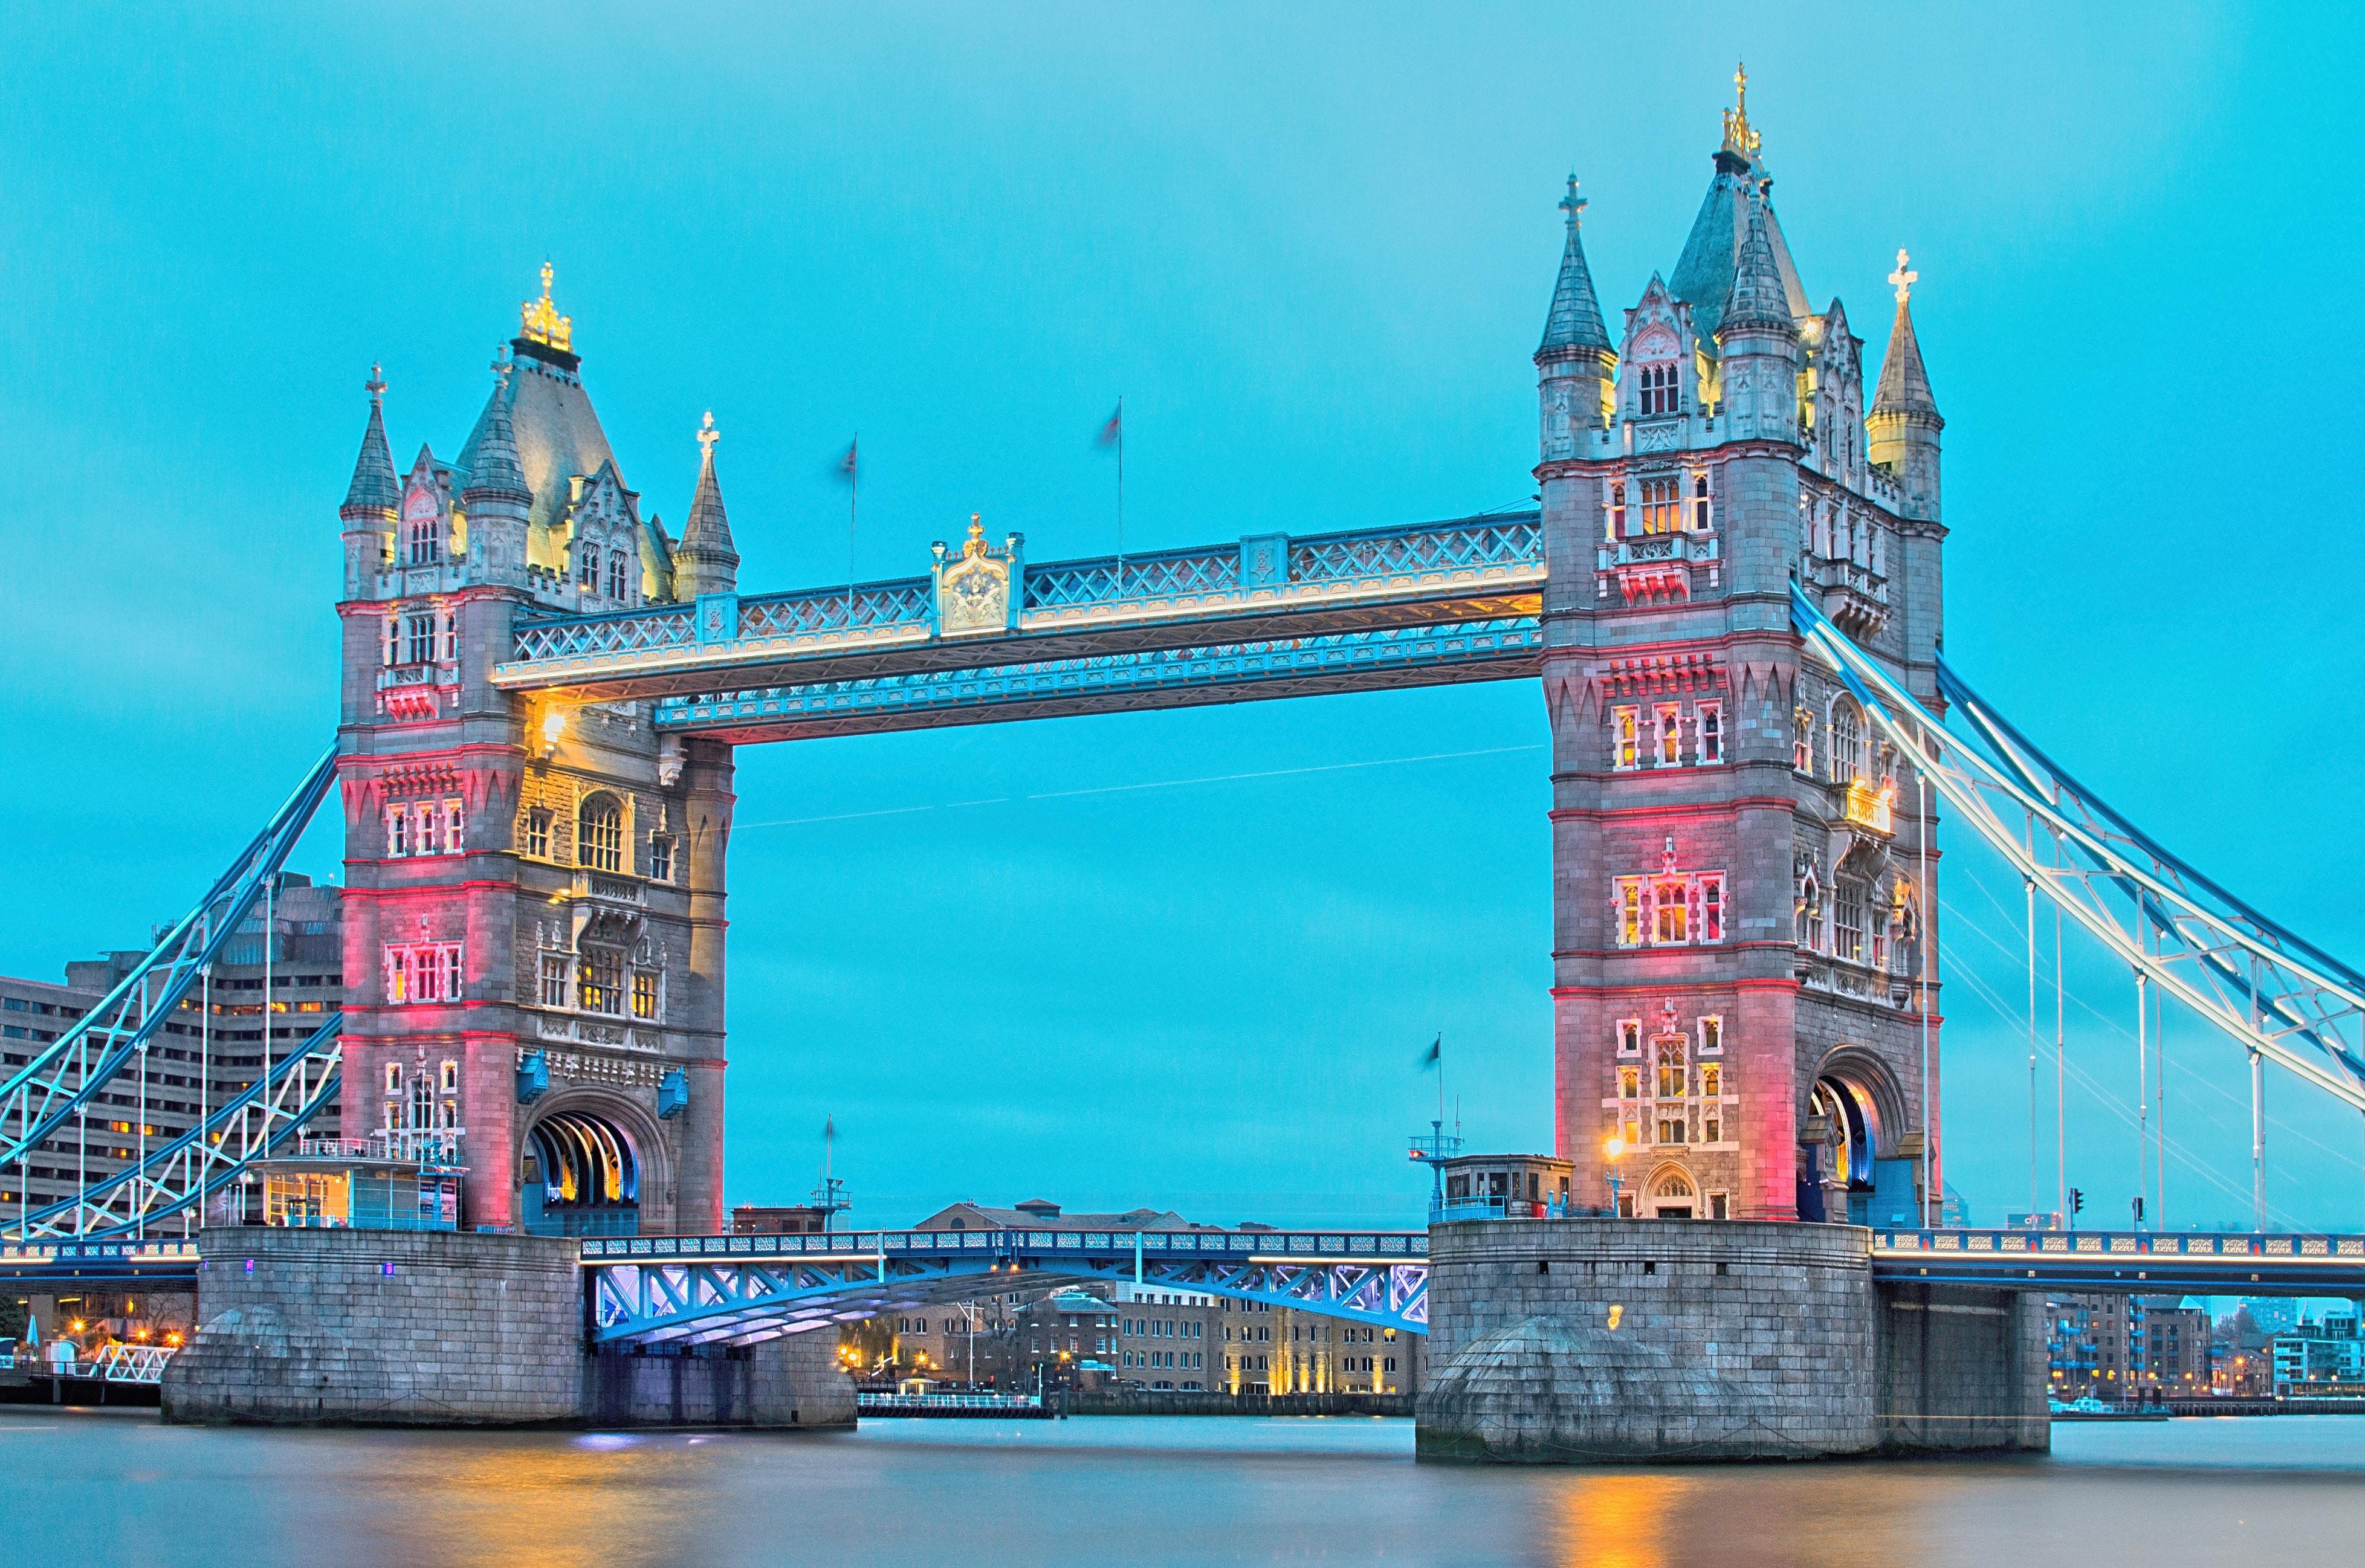 The Bridge london stories